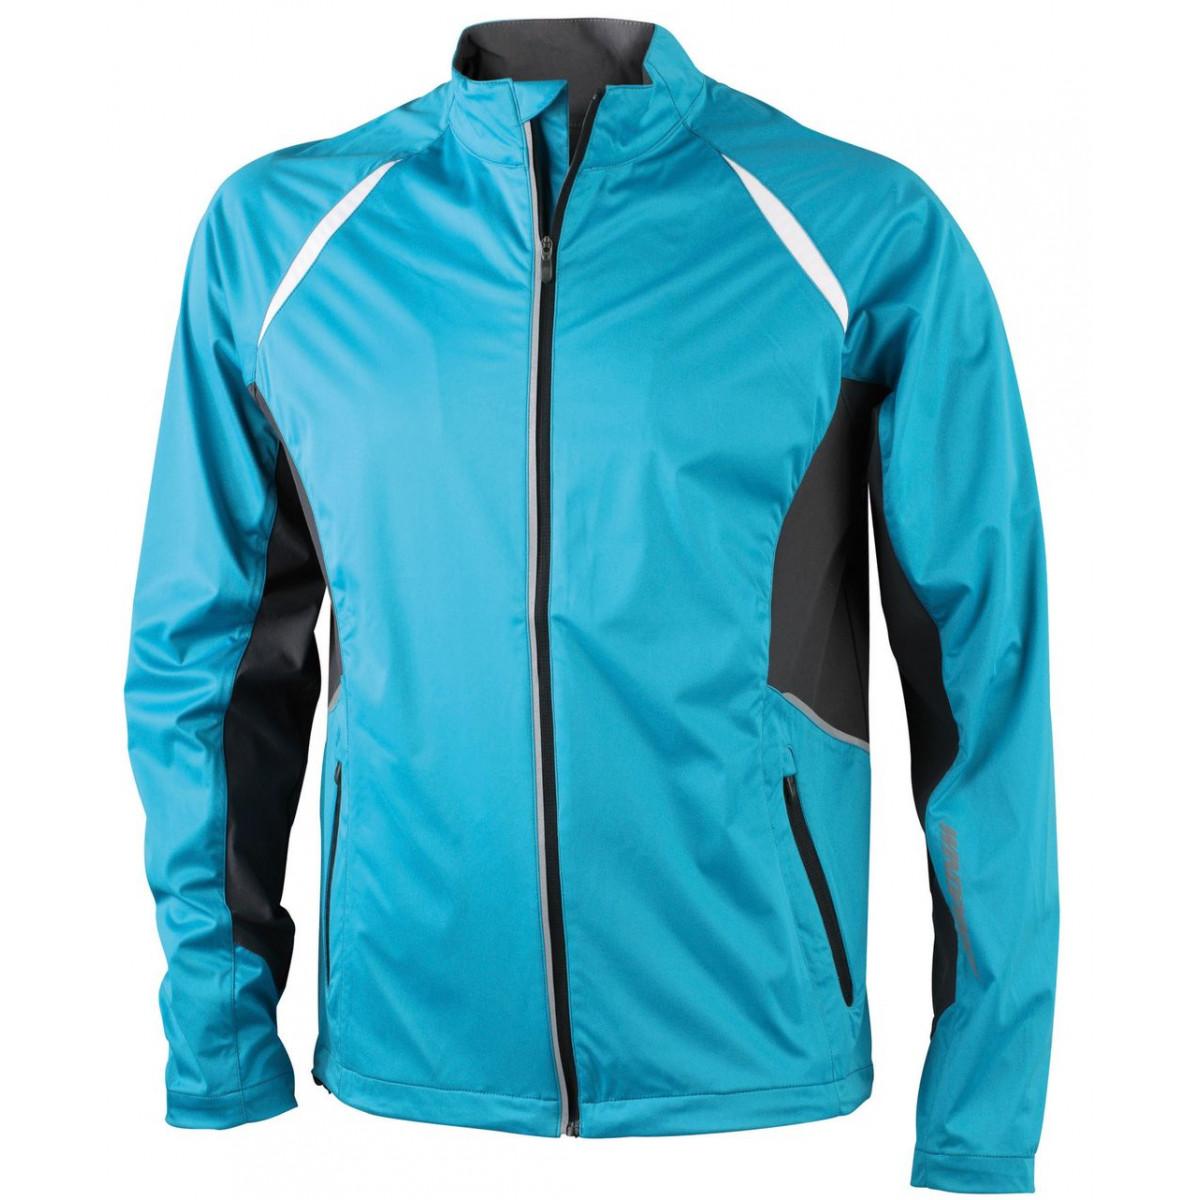 Куртка мужская JN440 Mens Sports Jacket Windproof - Бирюзовый/Темно-серый